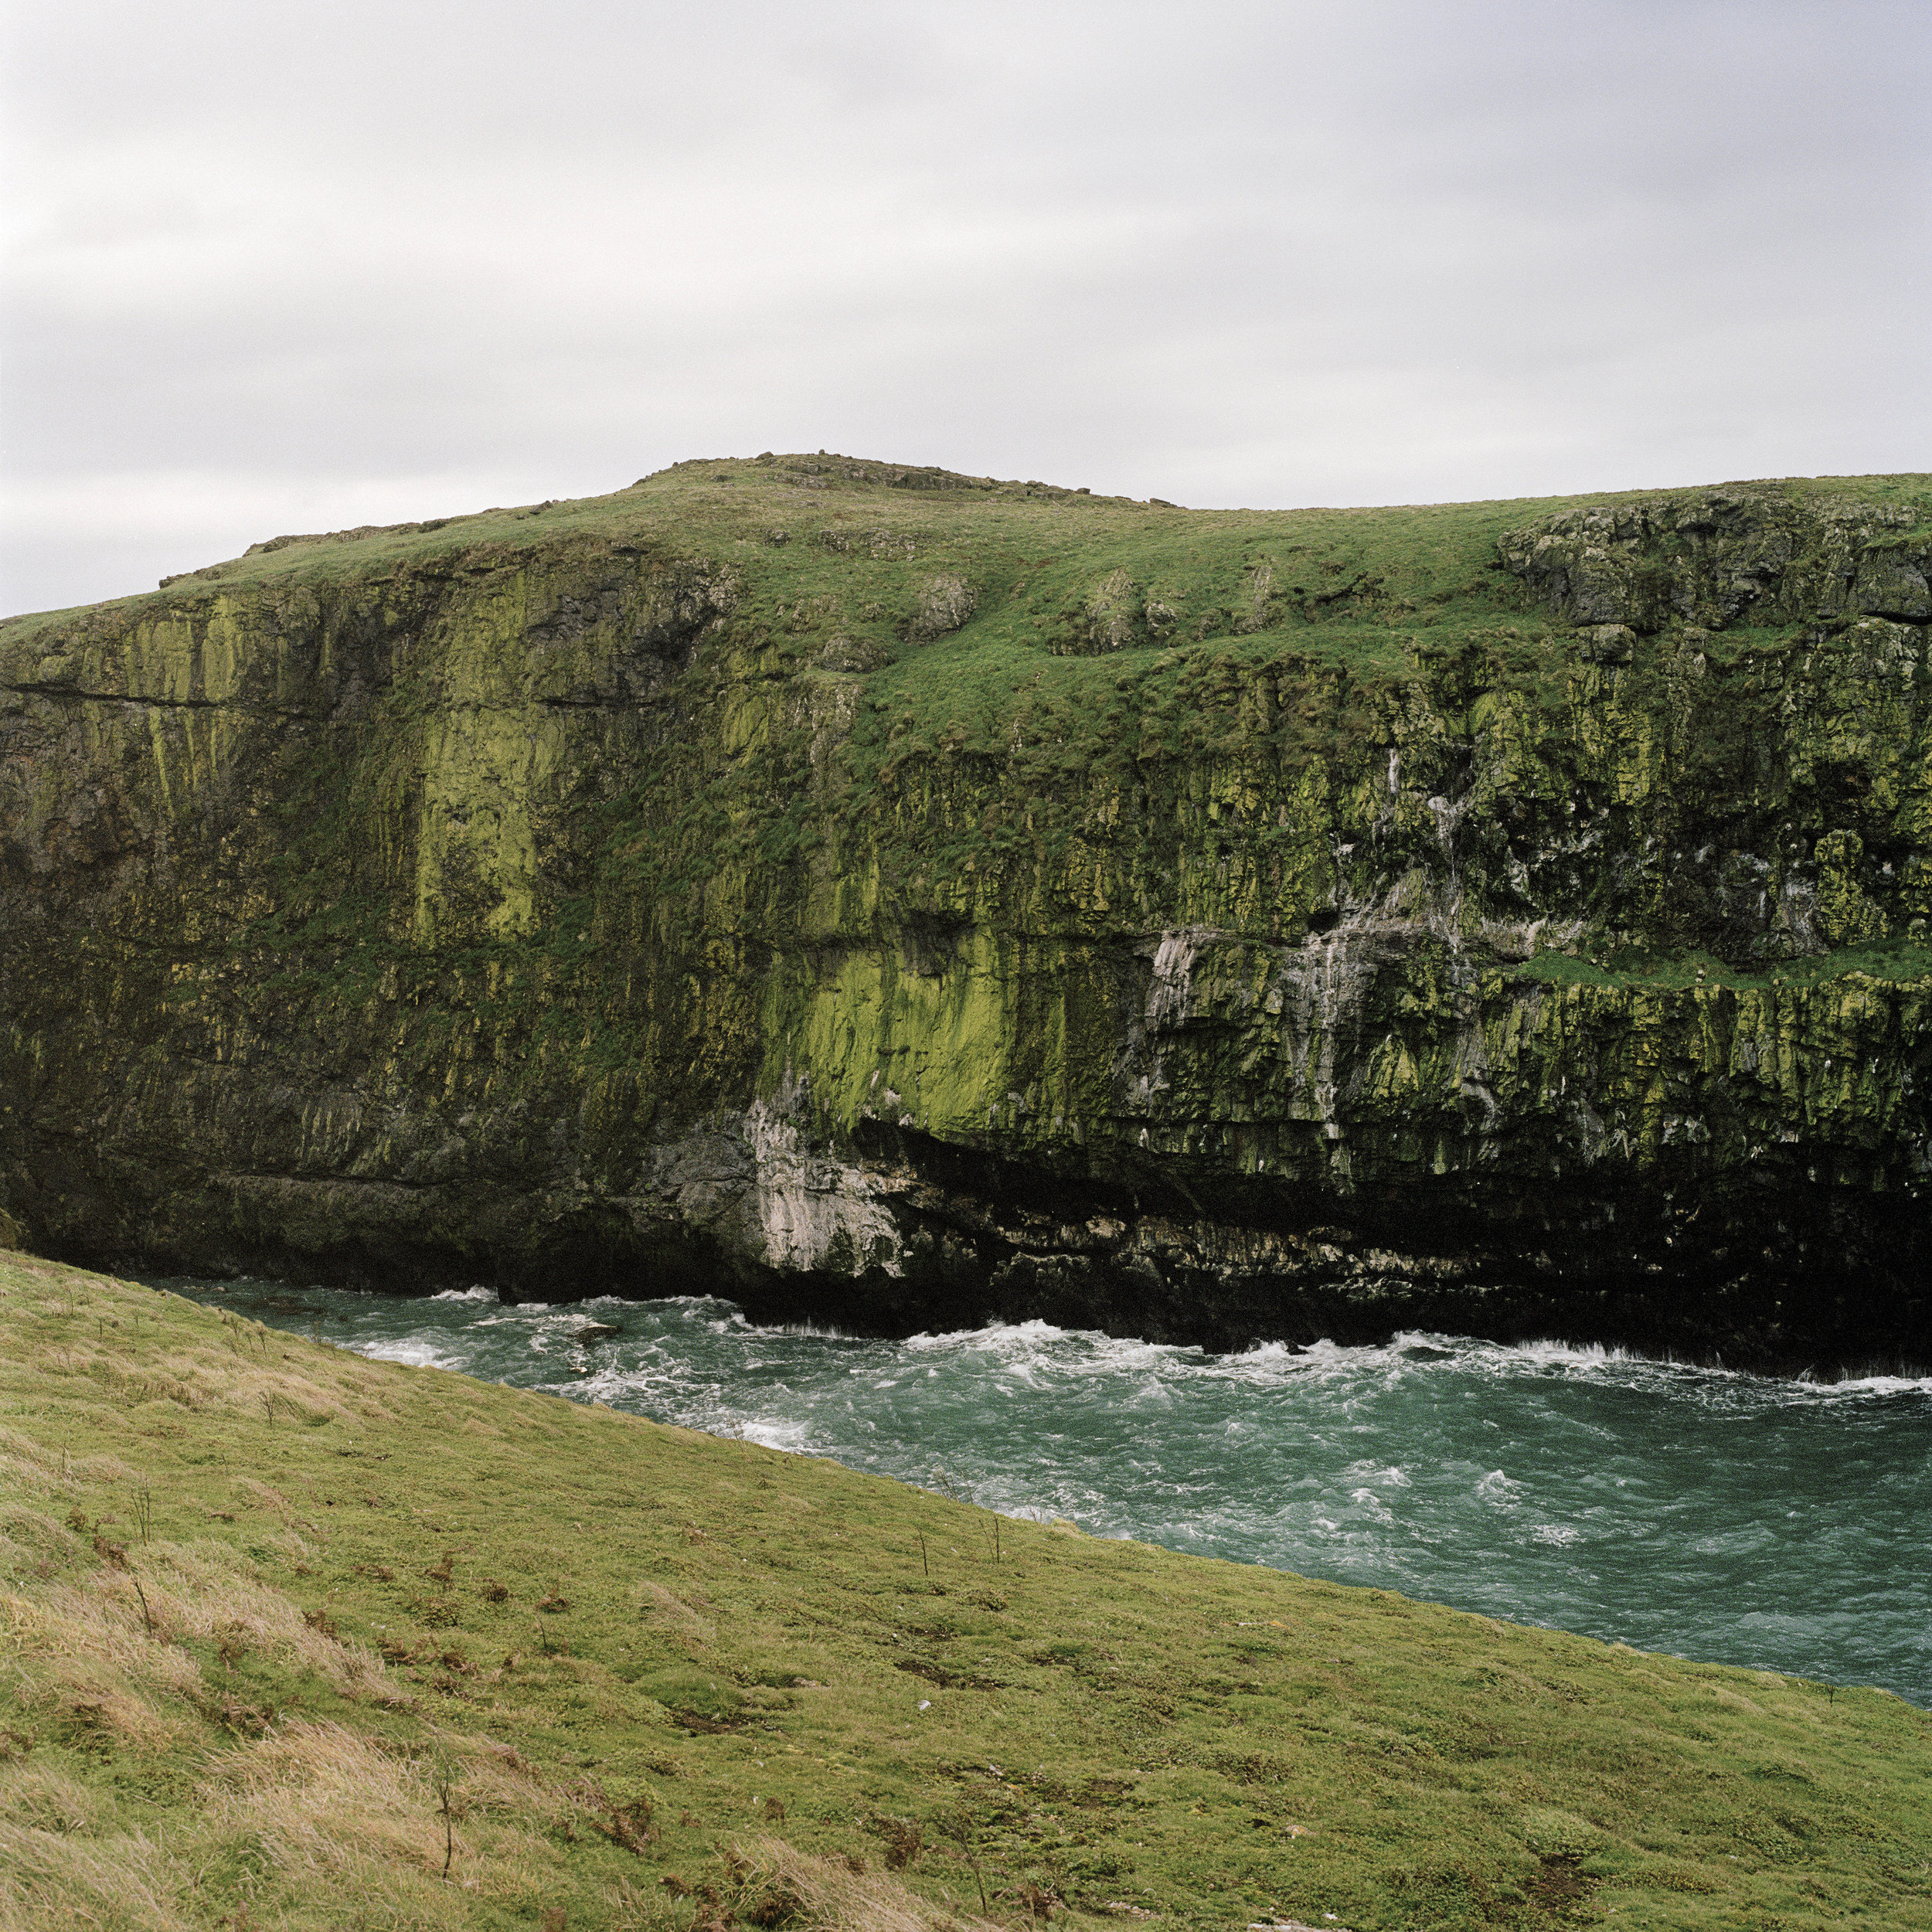 The Wick, Skomer Island